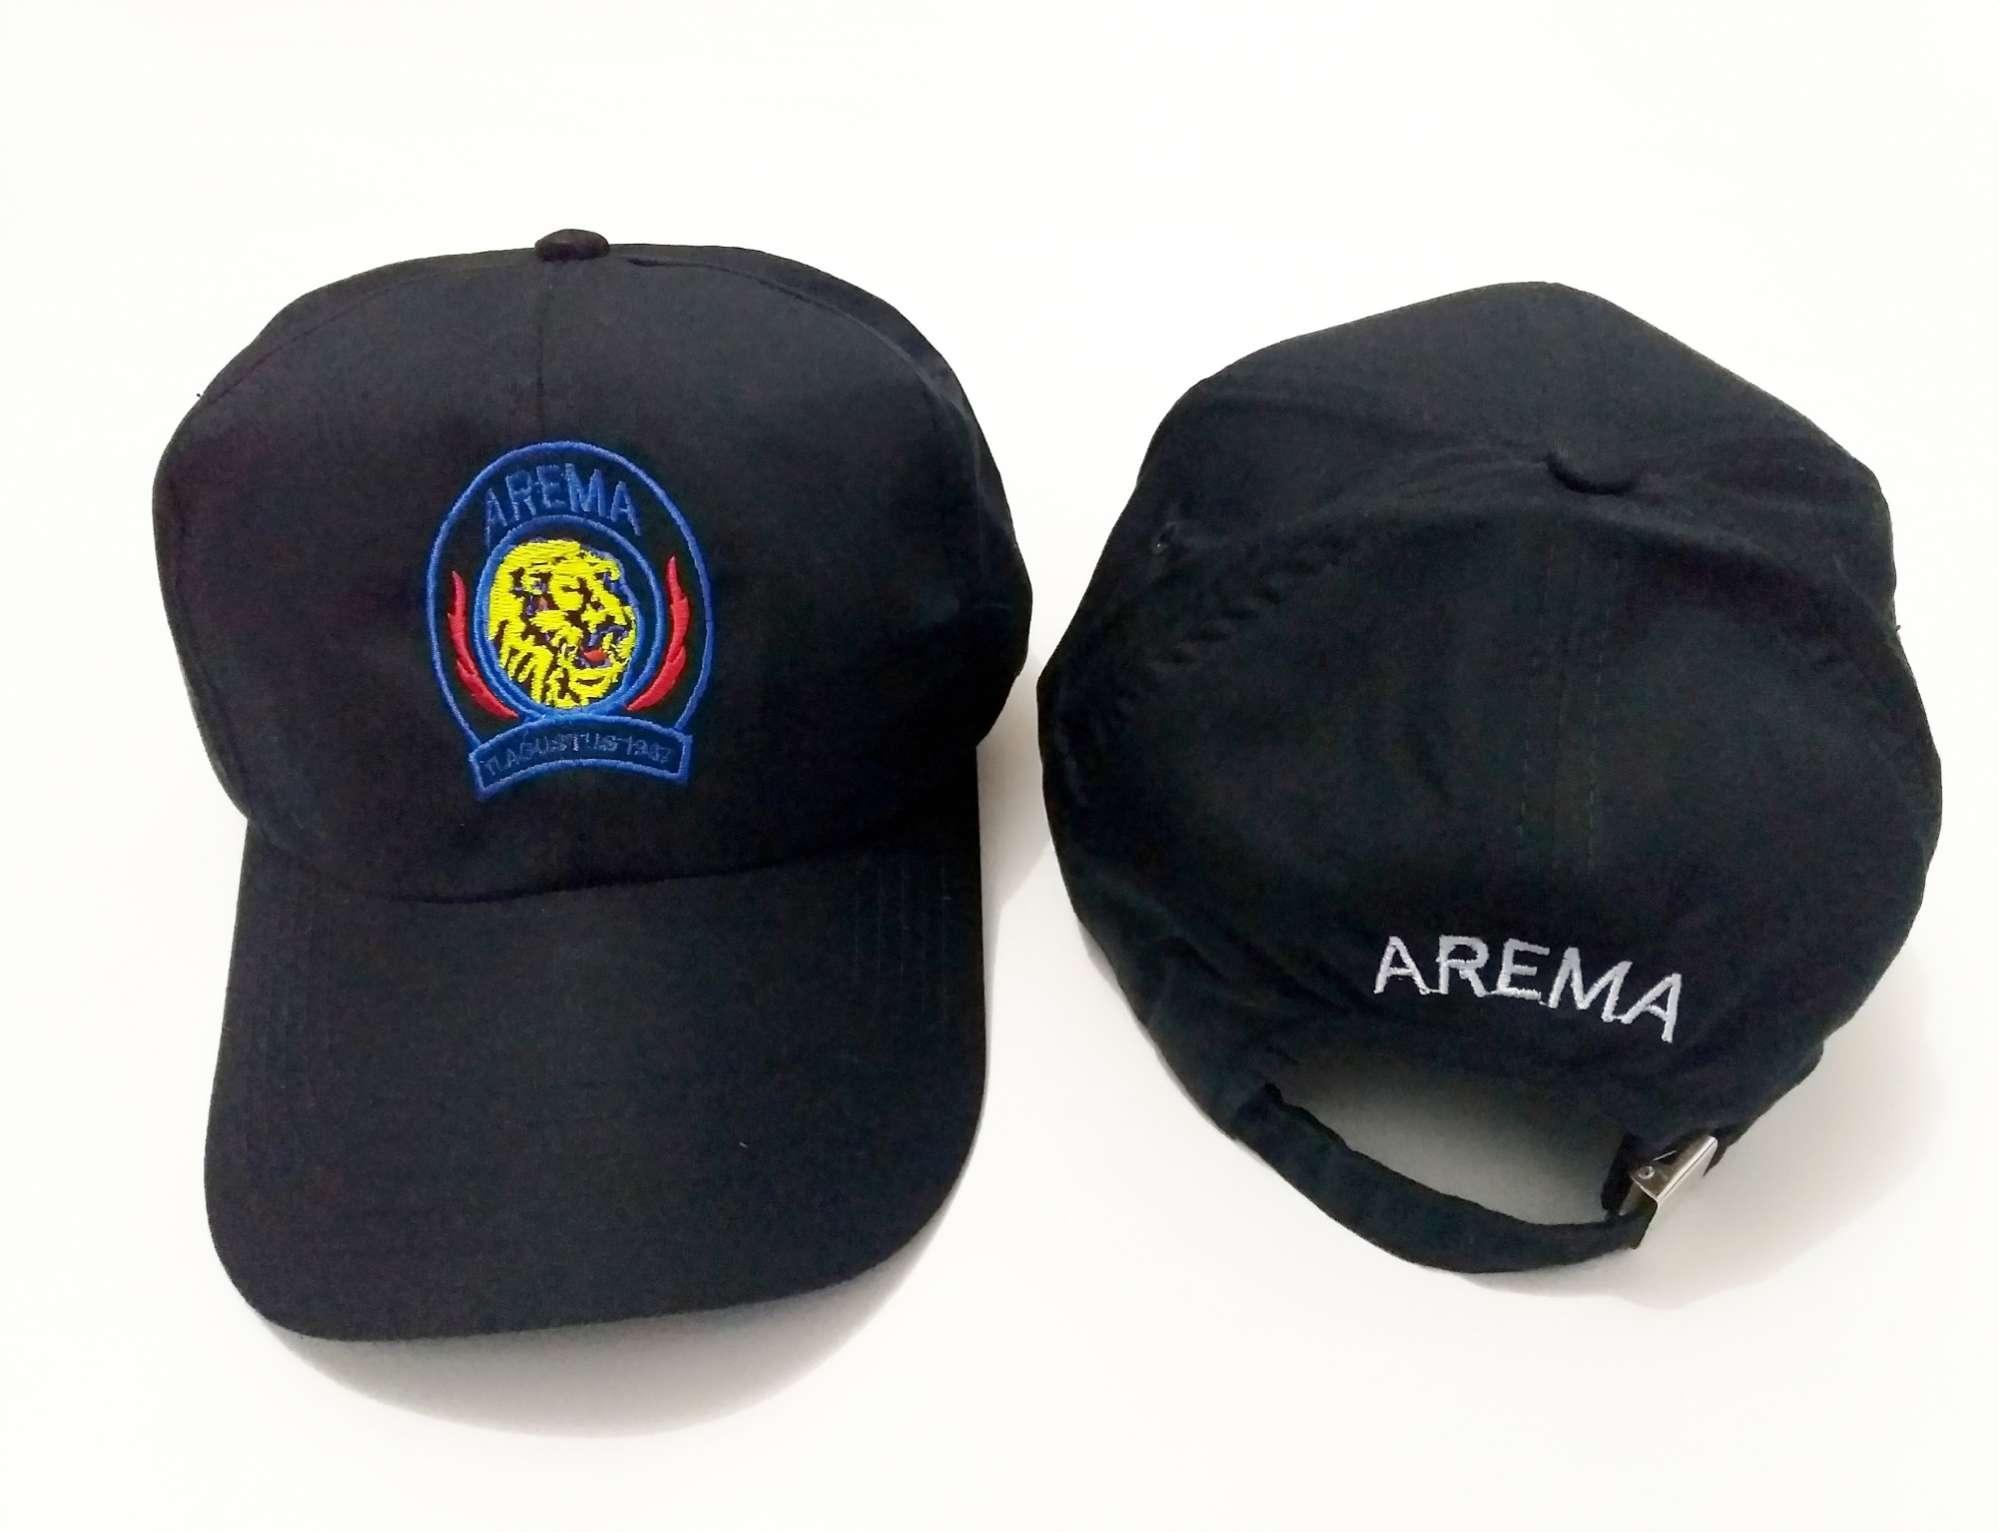 Topi Arema Malang Logo Lama By Df Store Bgr.